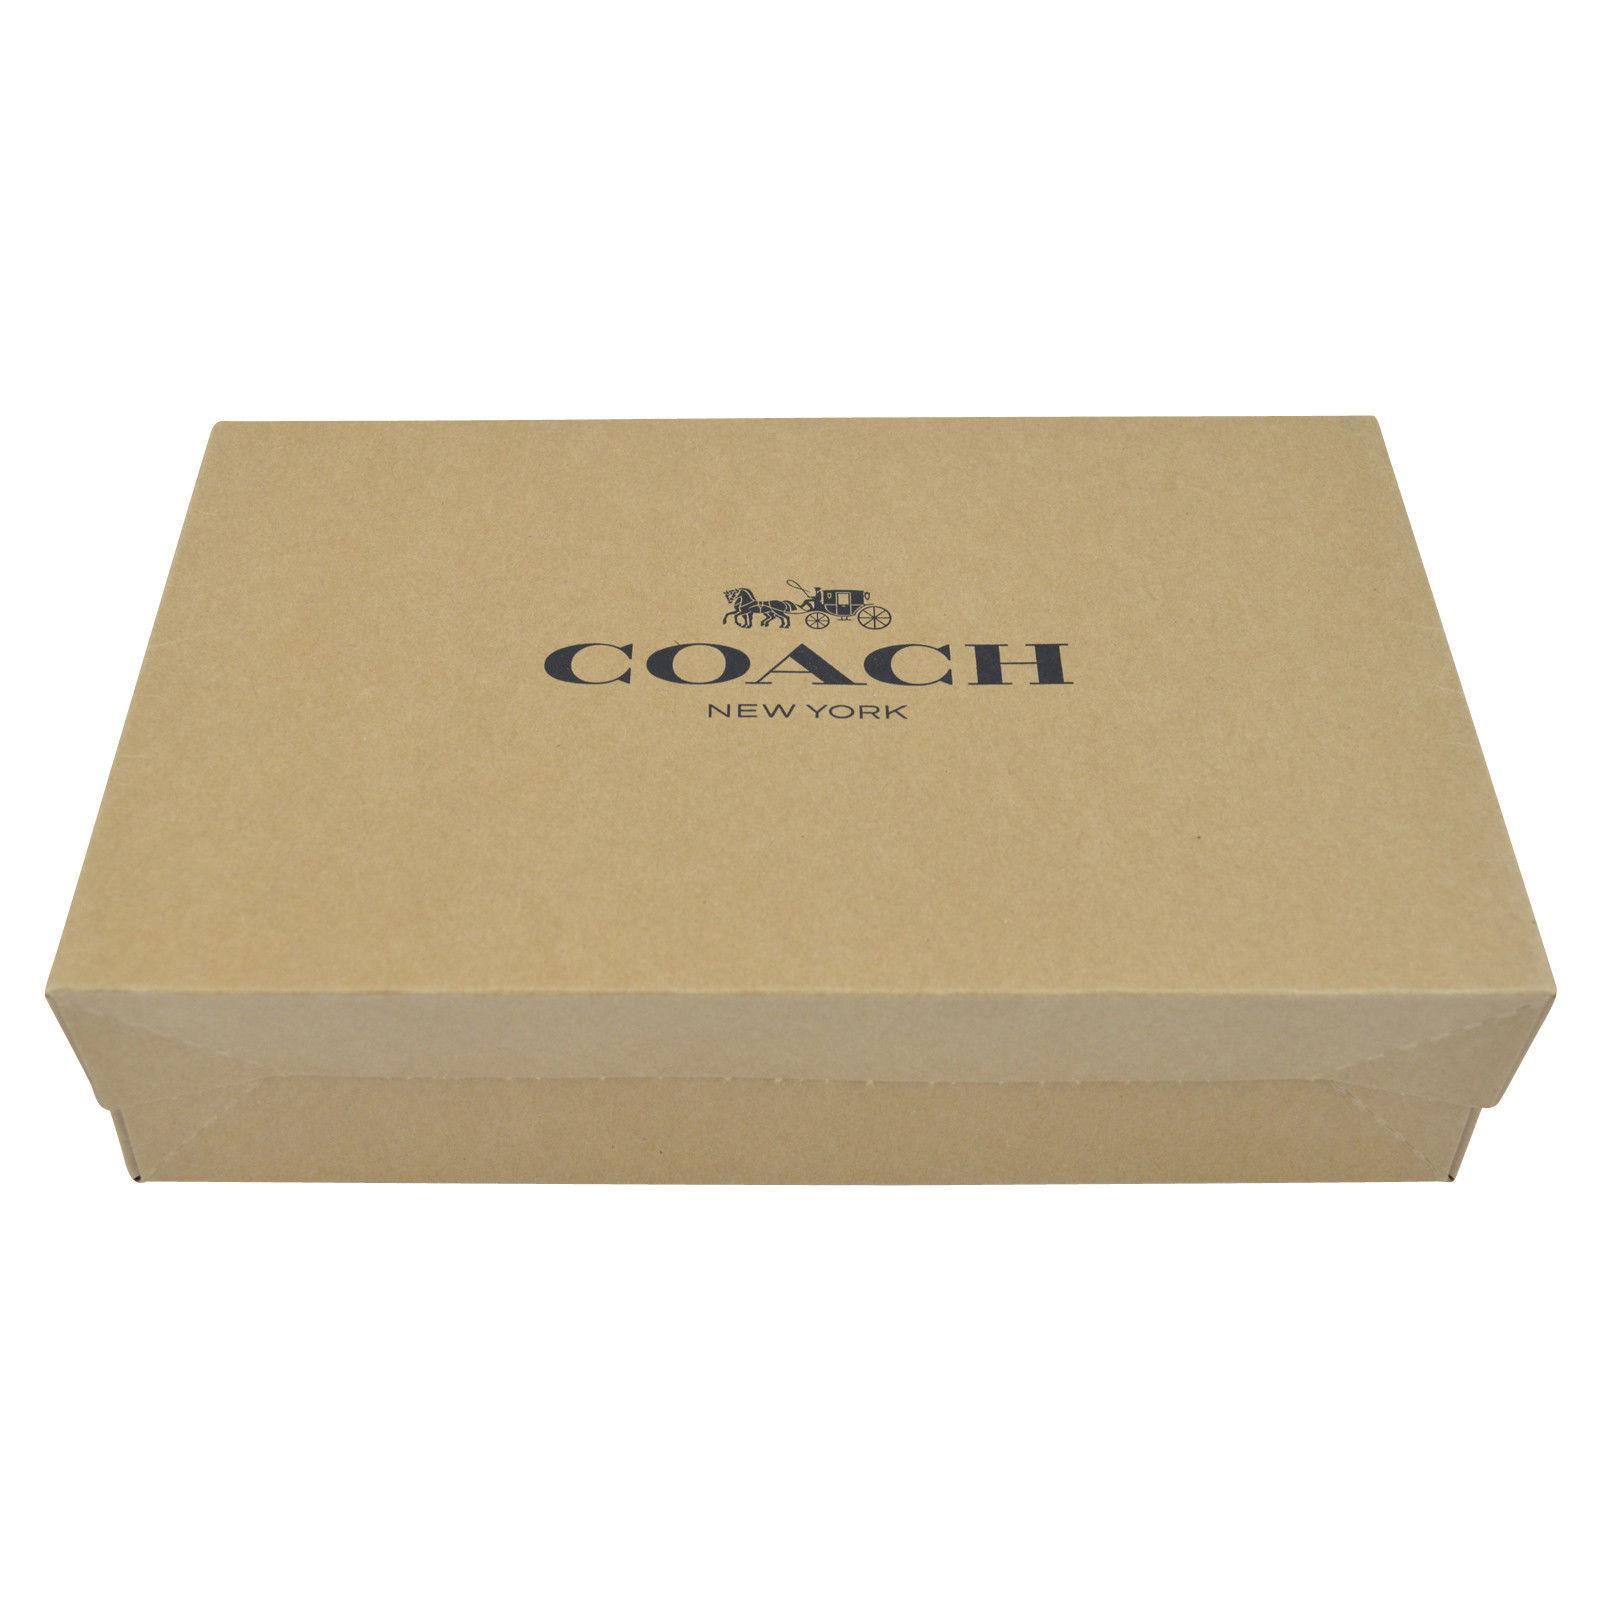 Coach Medium Gift Box For Wallets, Wristlets Brown # GB3